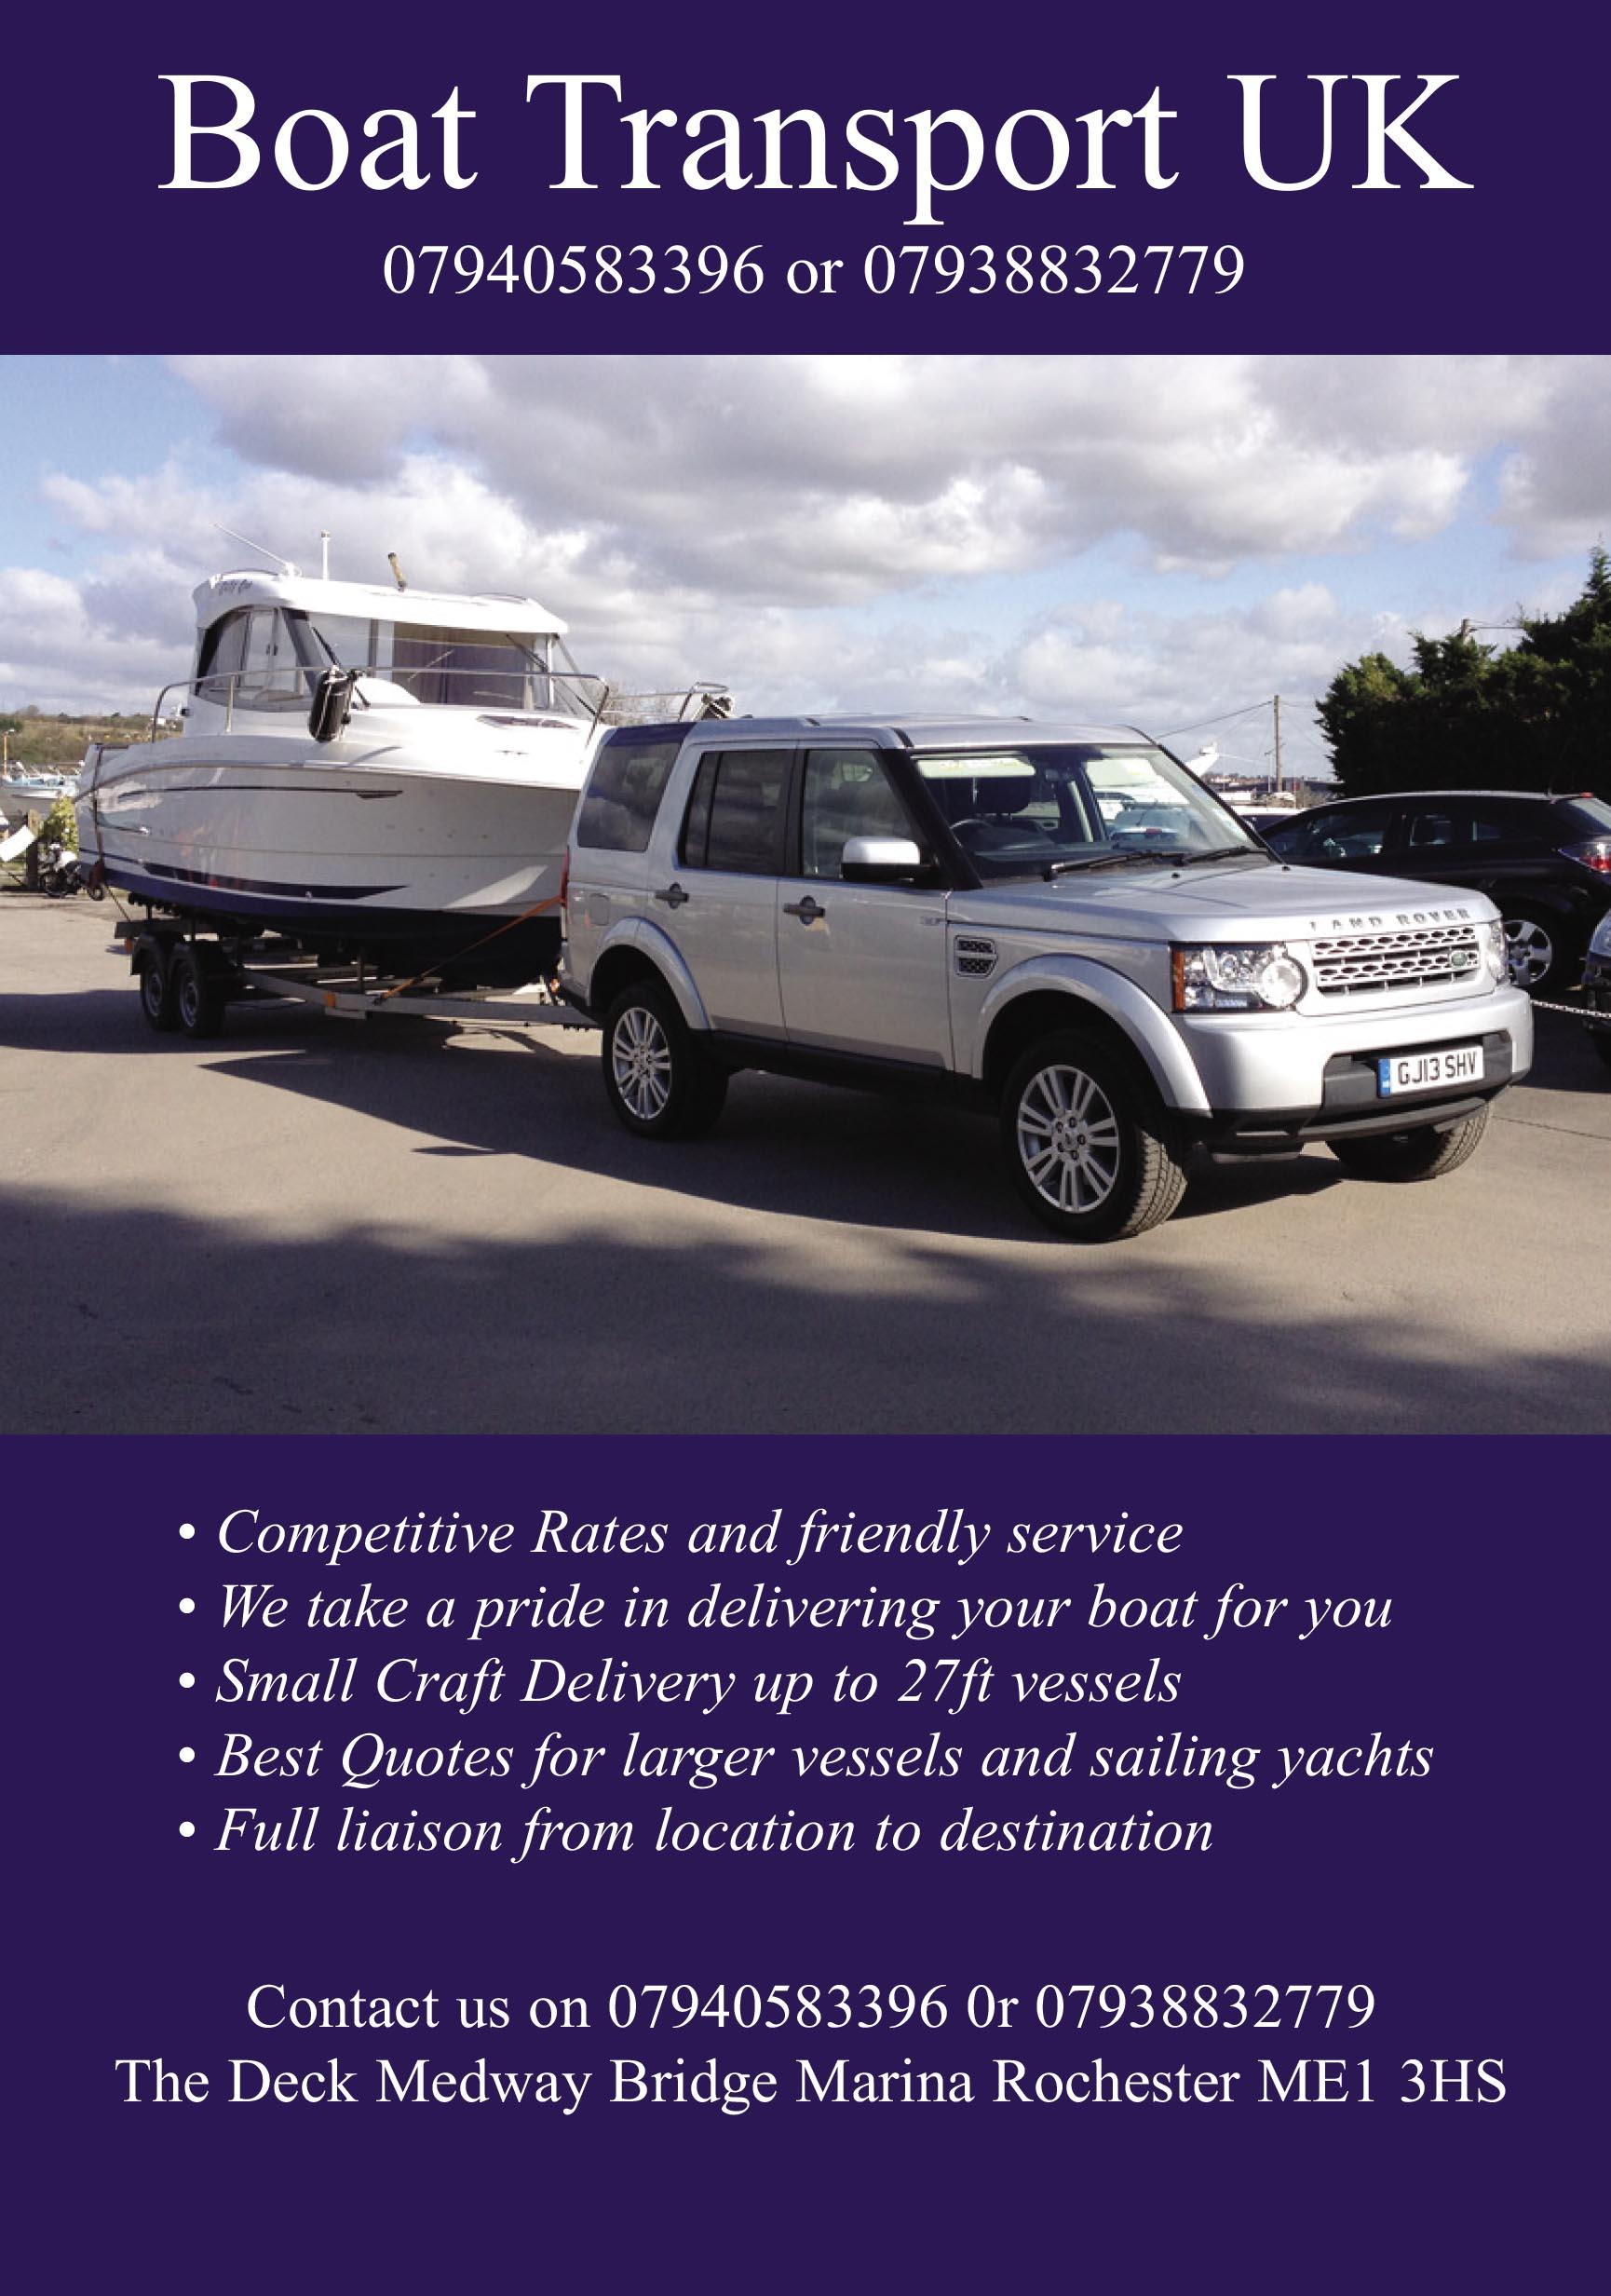 Boat Transport UK